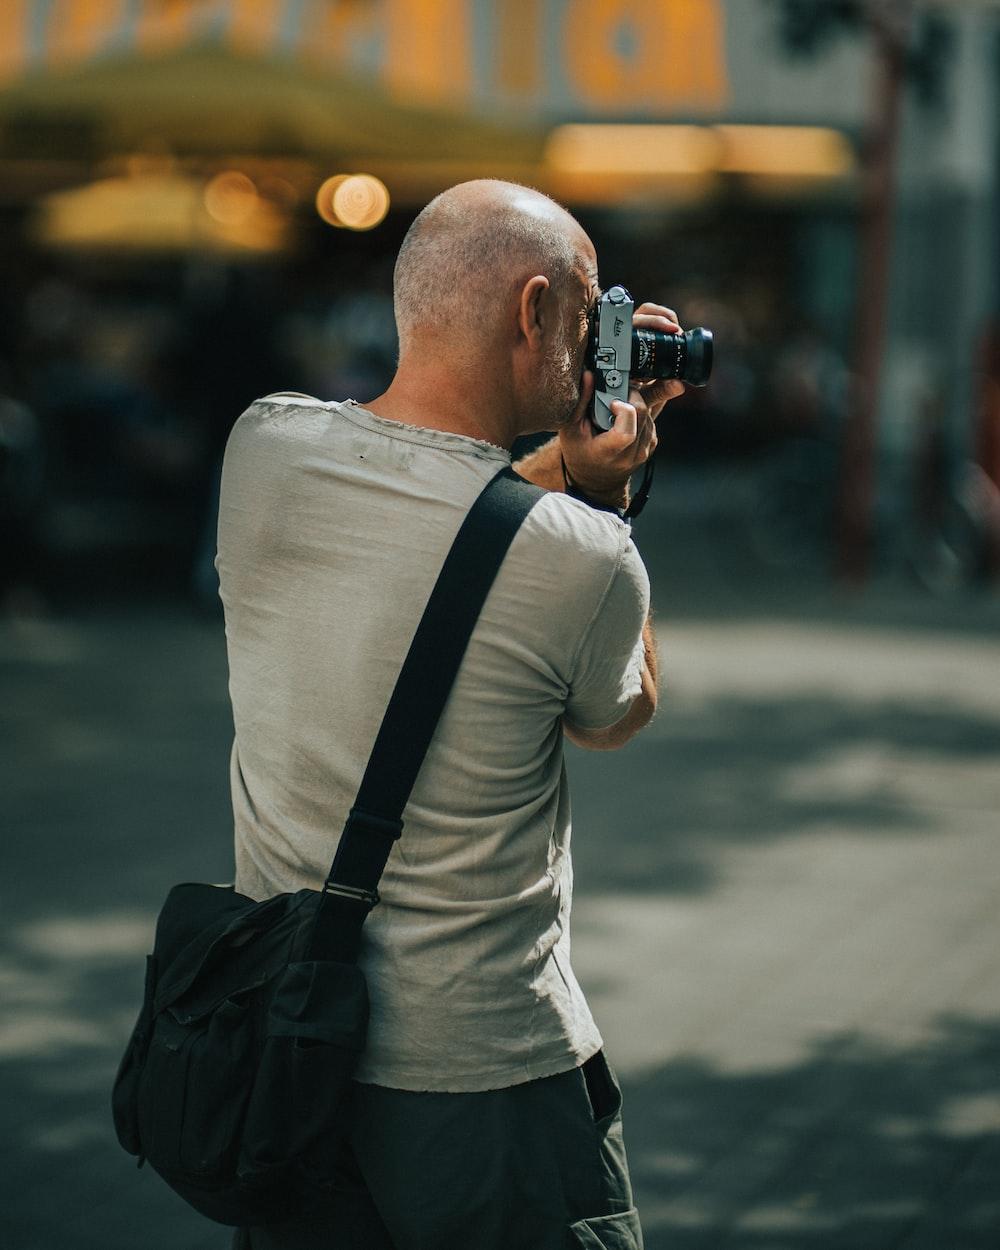 man wearing gray crew-neck T-shirt holding DSLR camera